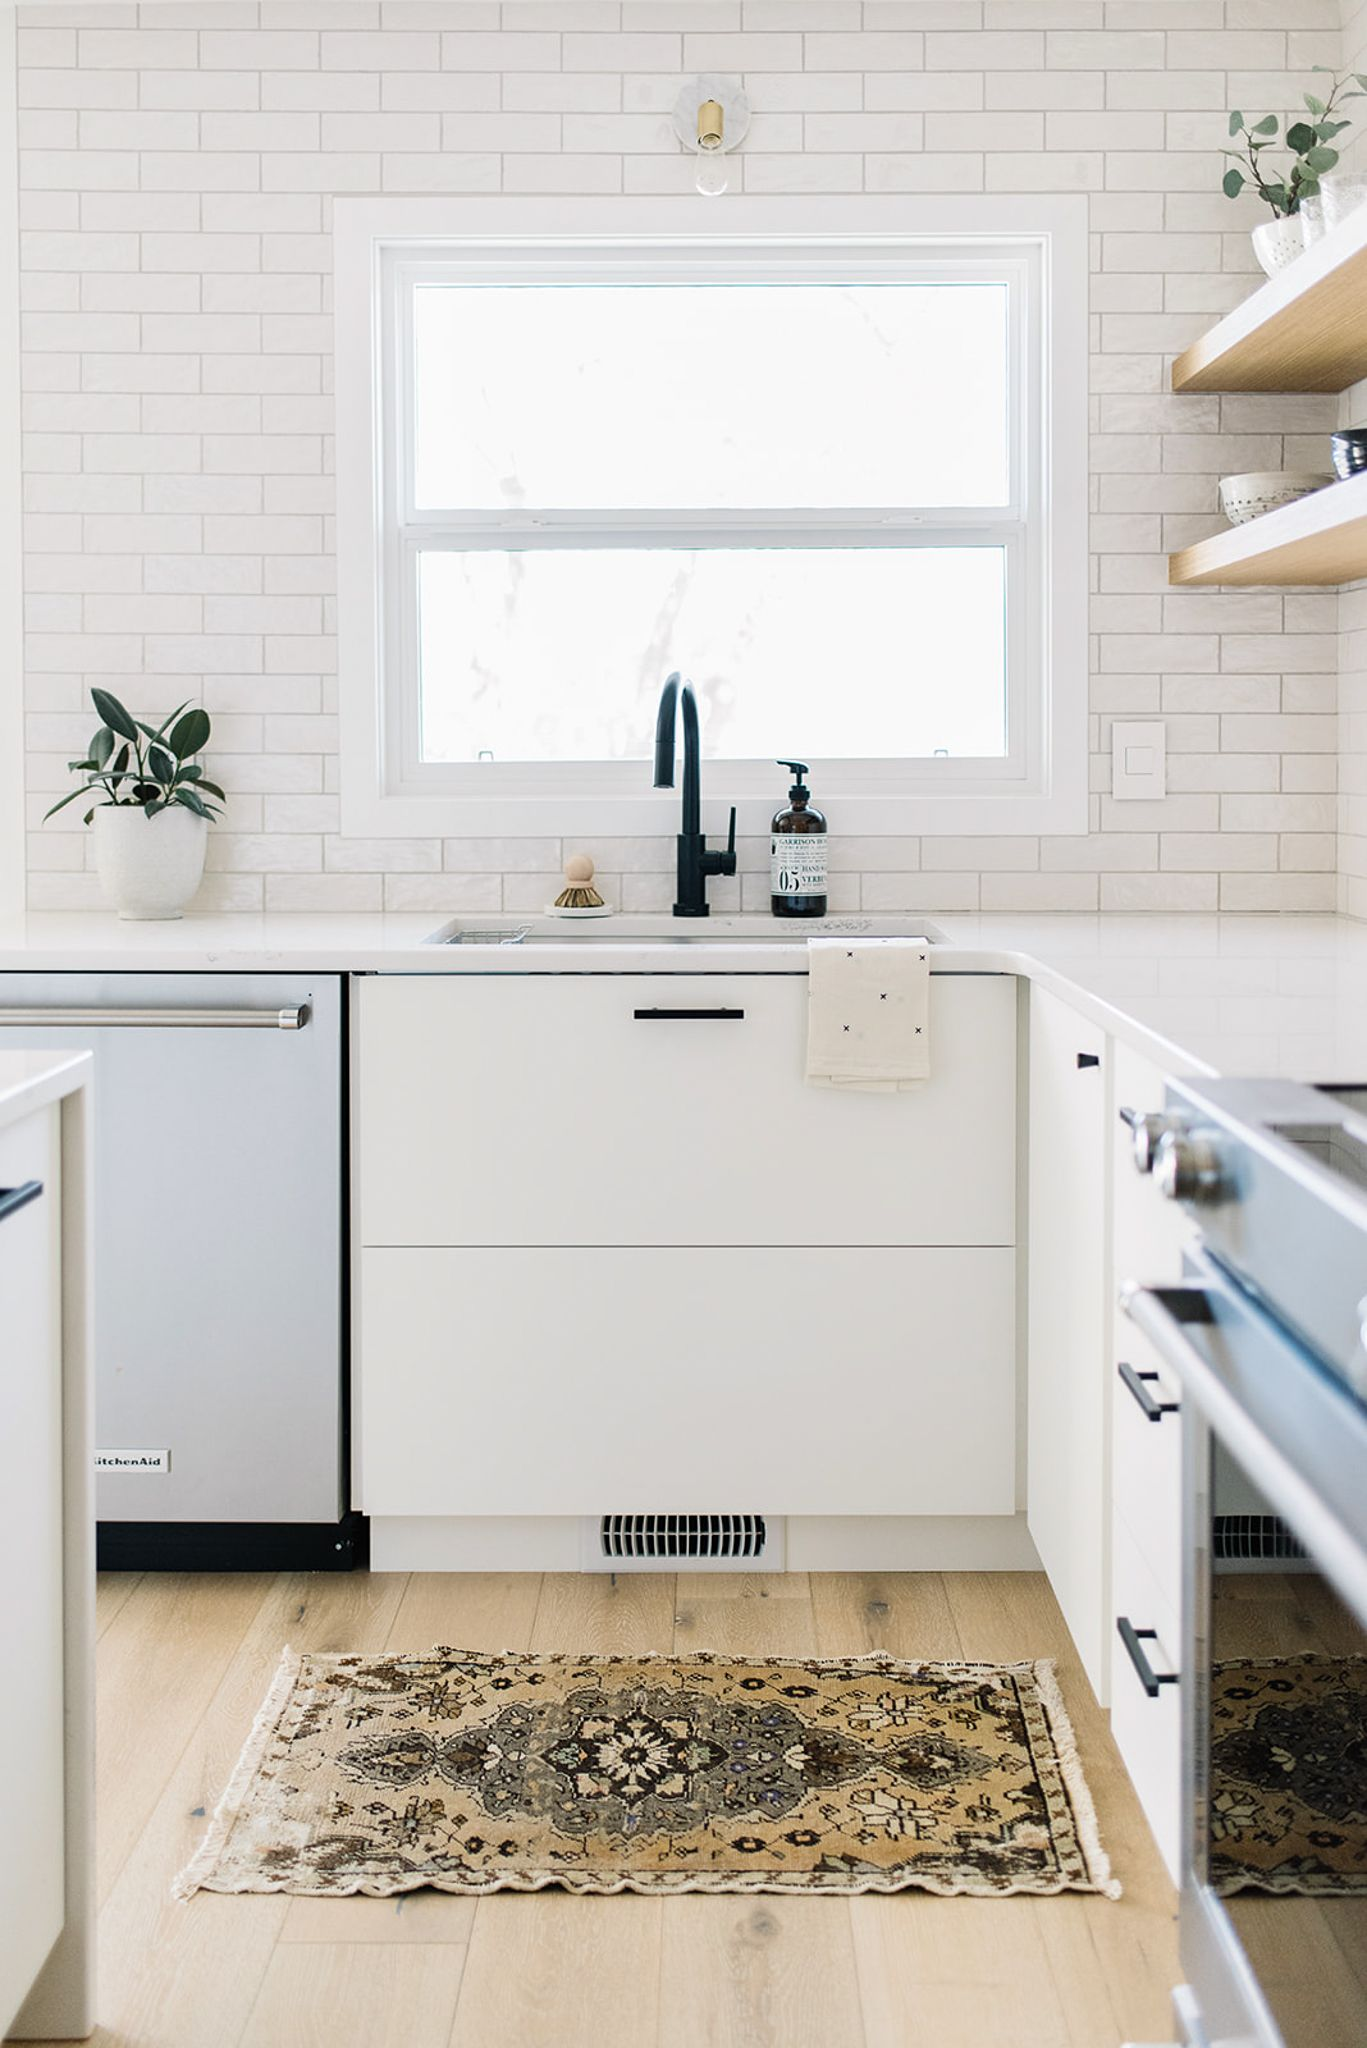 Window treatment ideas for above kitchen sink  ravine house kitchen one room challenge u the reveal  cocinas